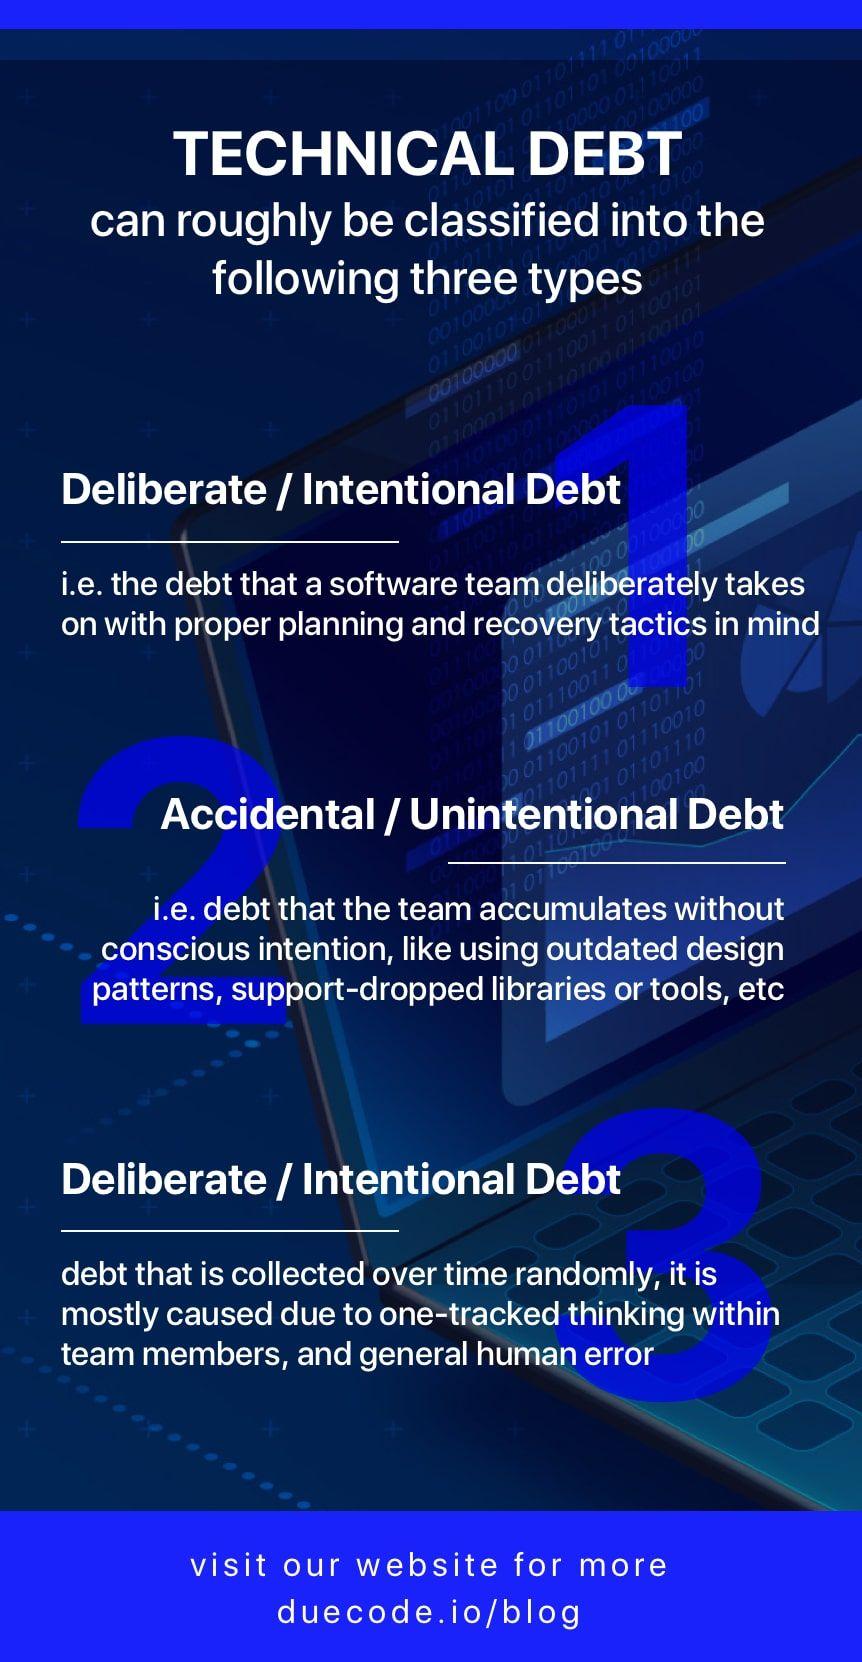 Technical Debt classification